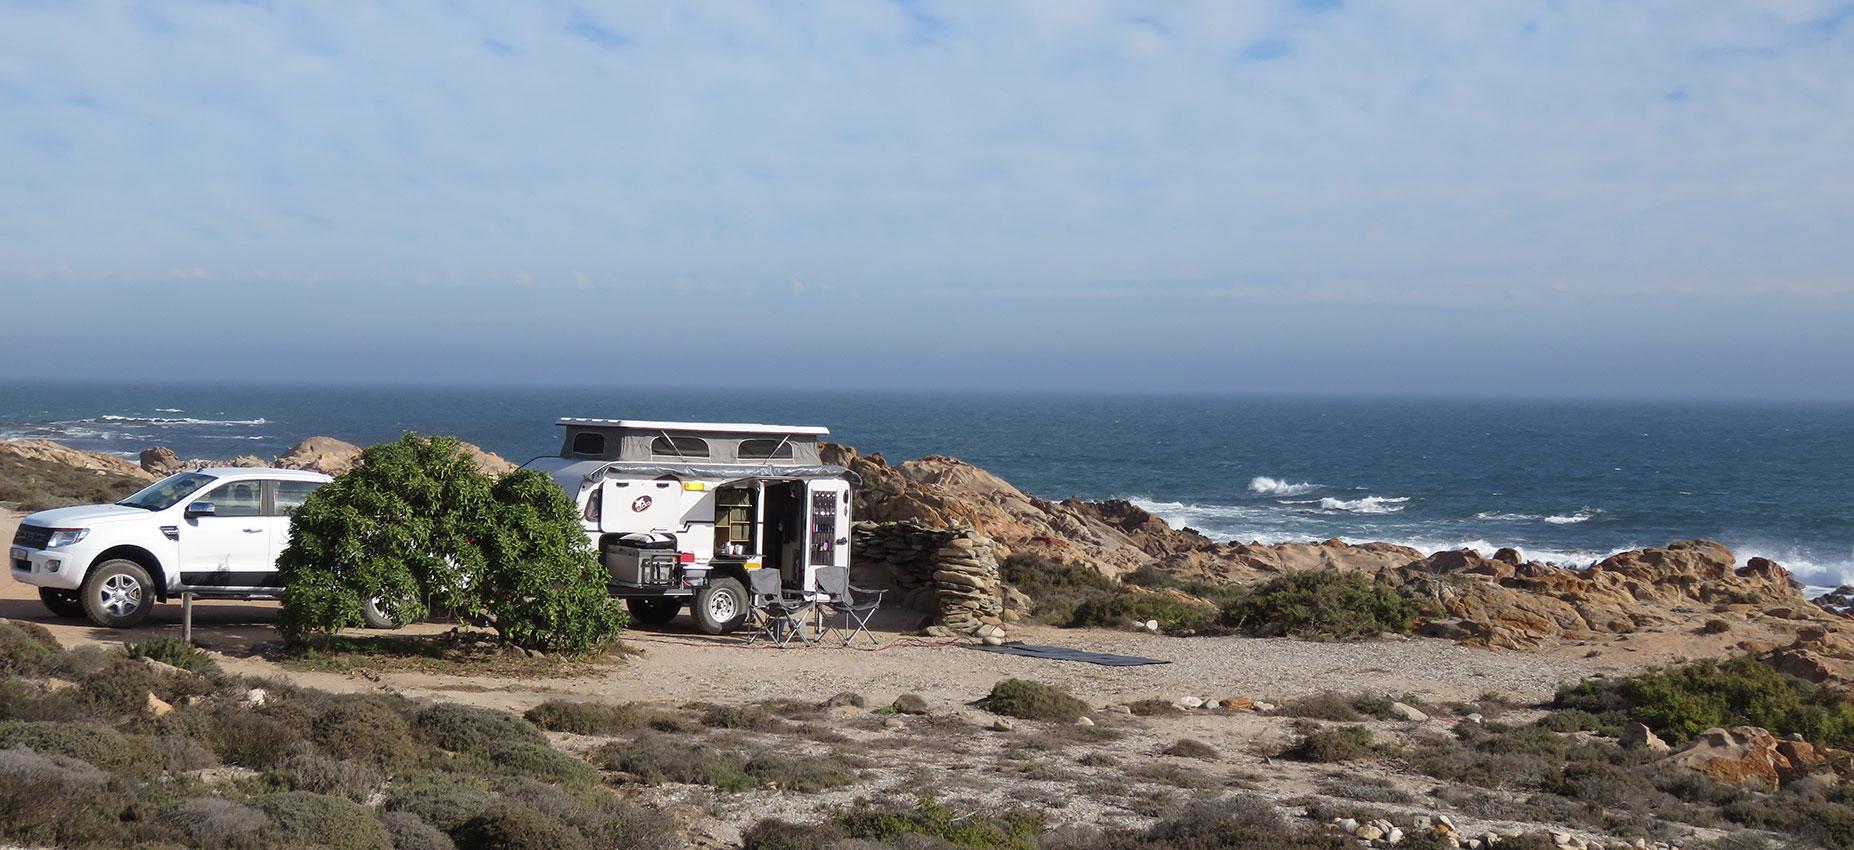 Offroad Caravan at the Beach